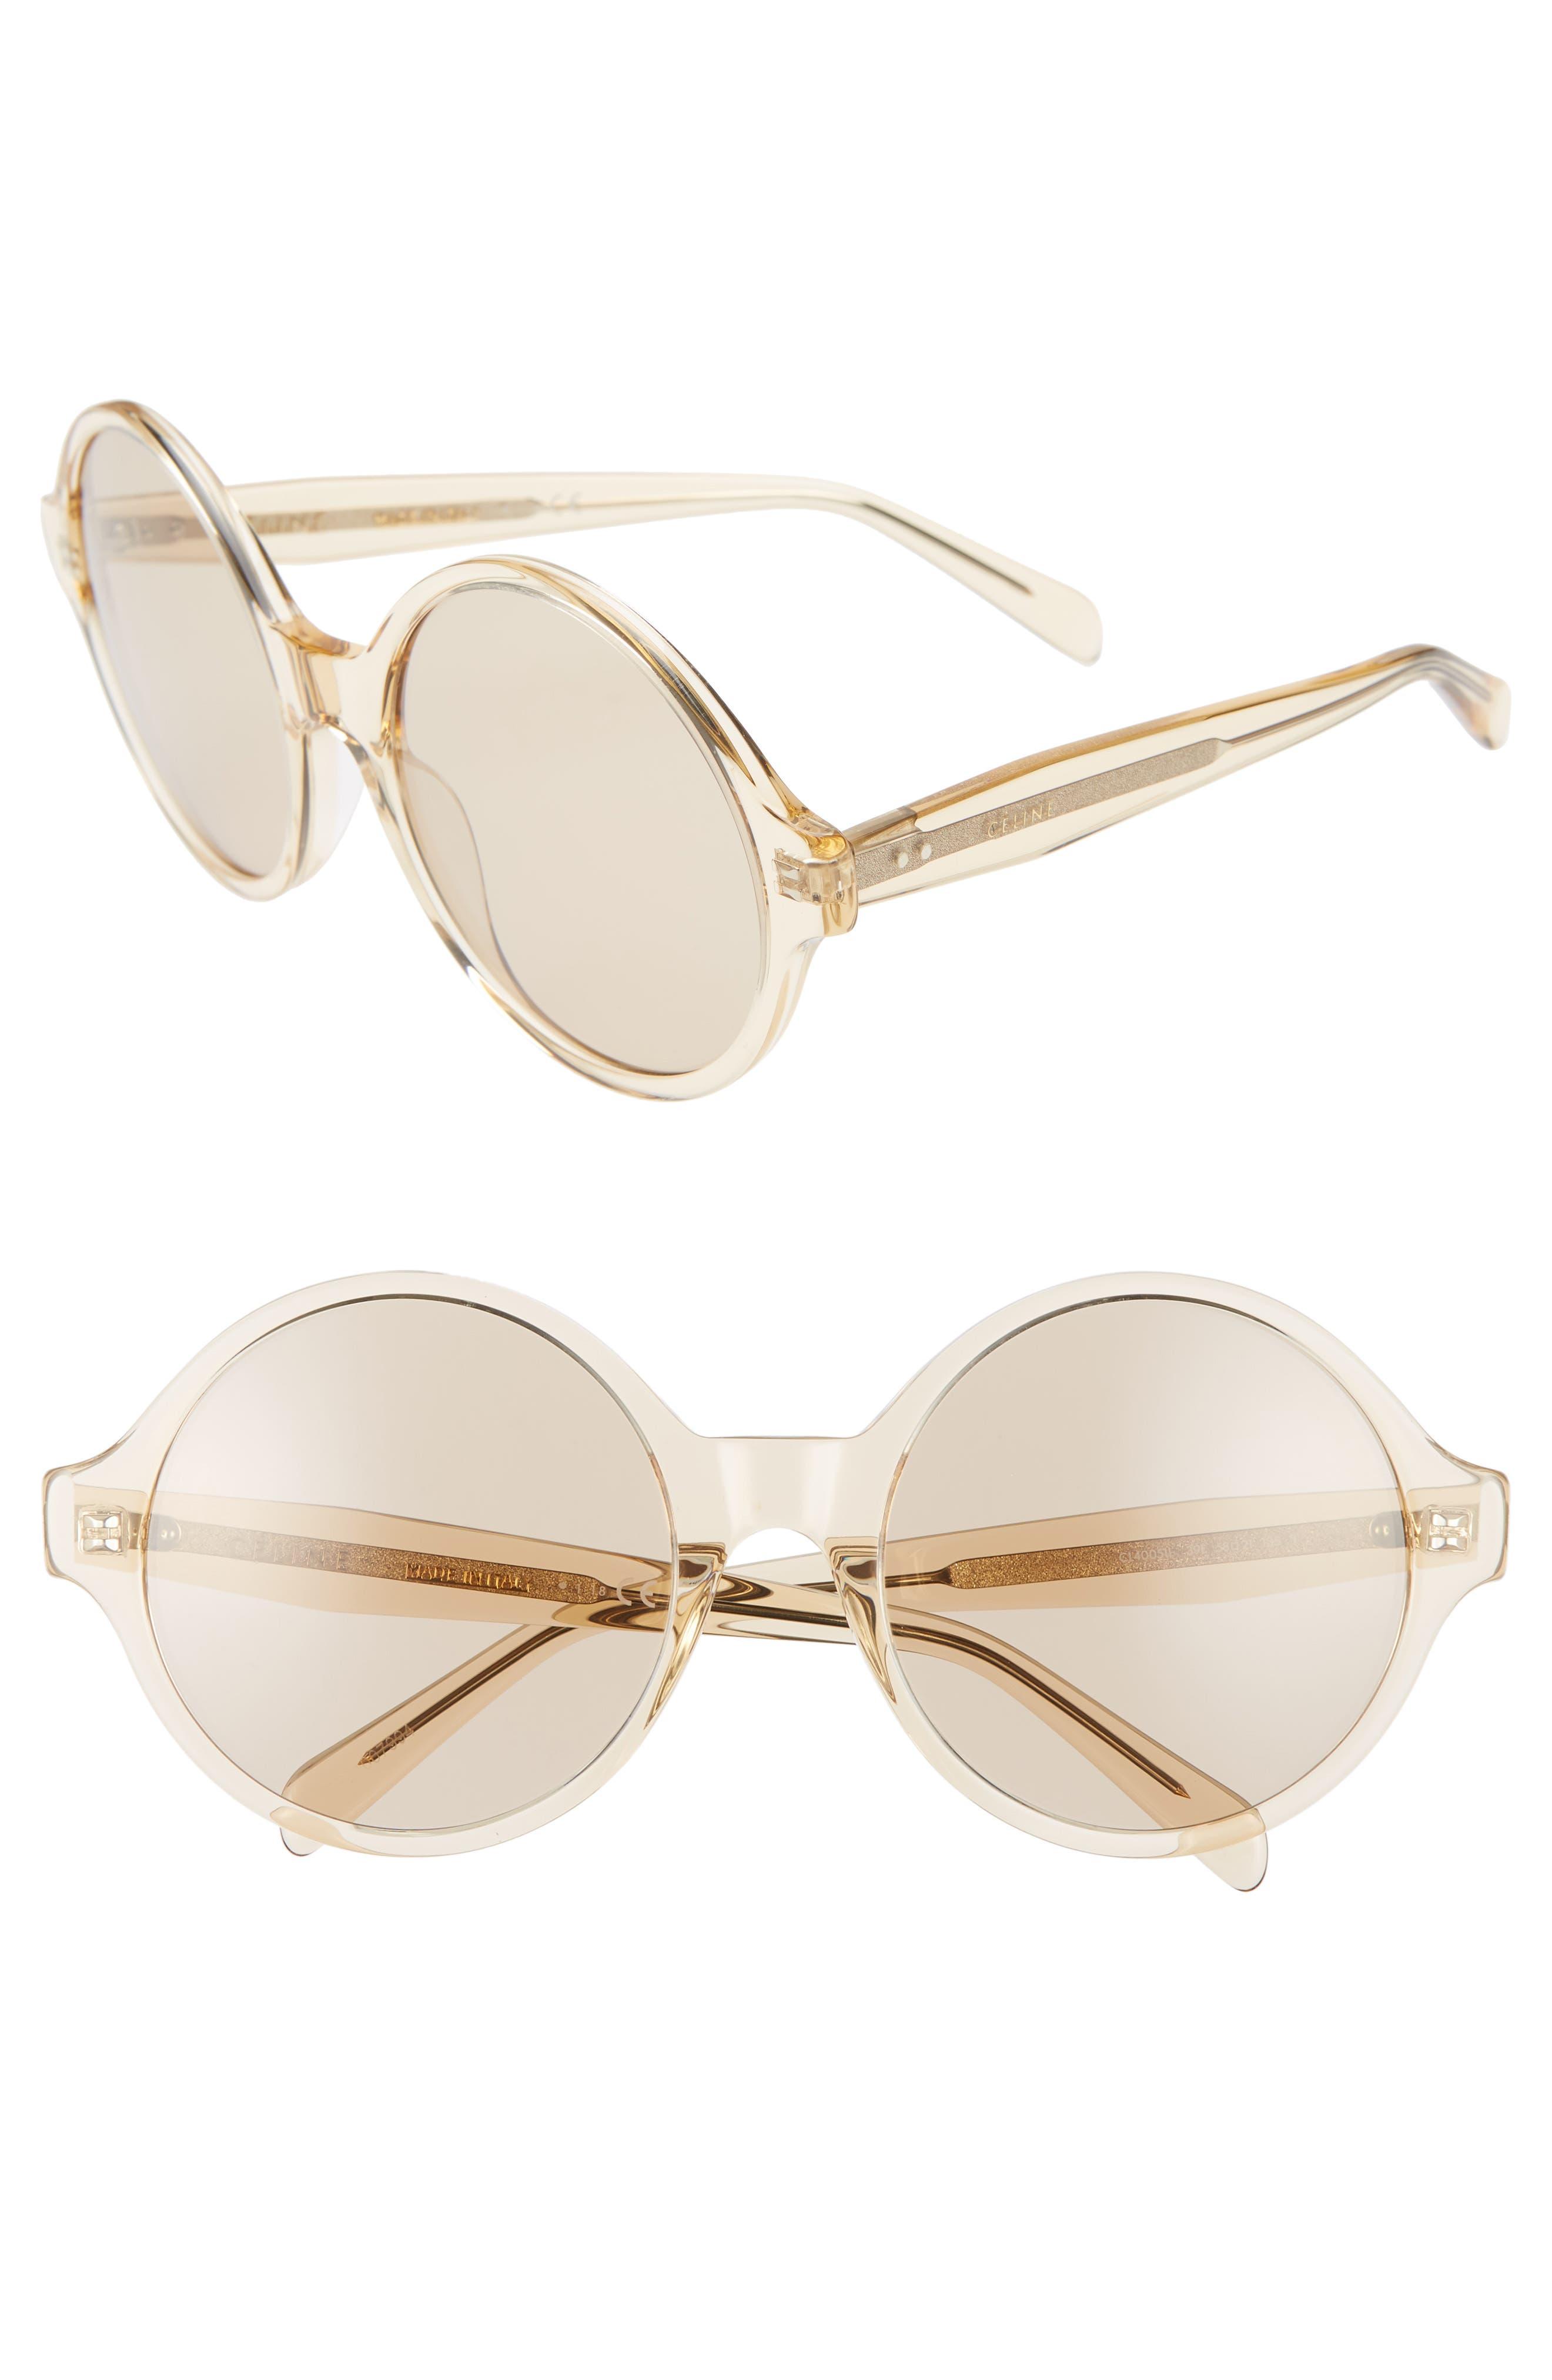 58mm Round Sunglasses, Main, color, TRANSPARENT OCHRE/ LIGHT BROWN